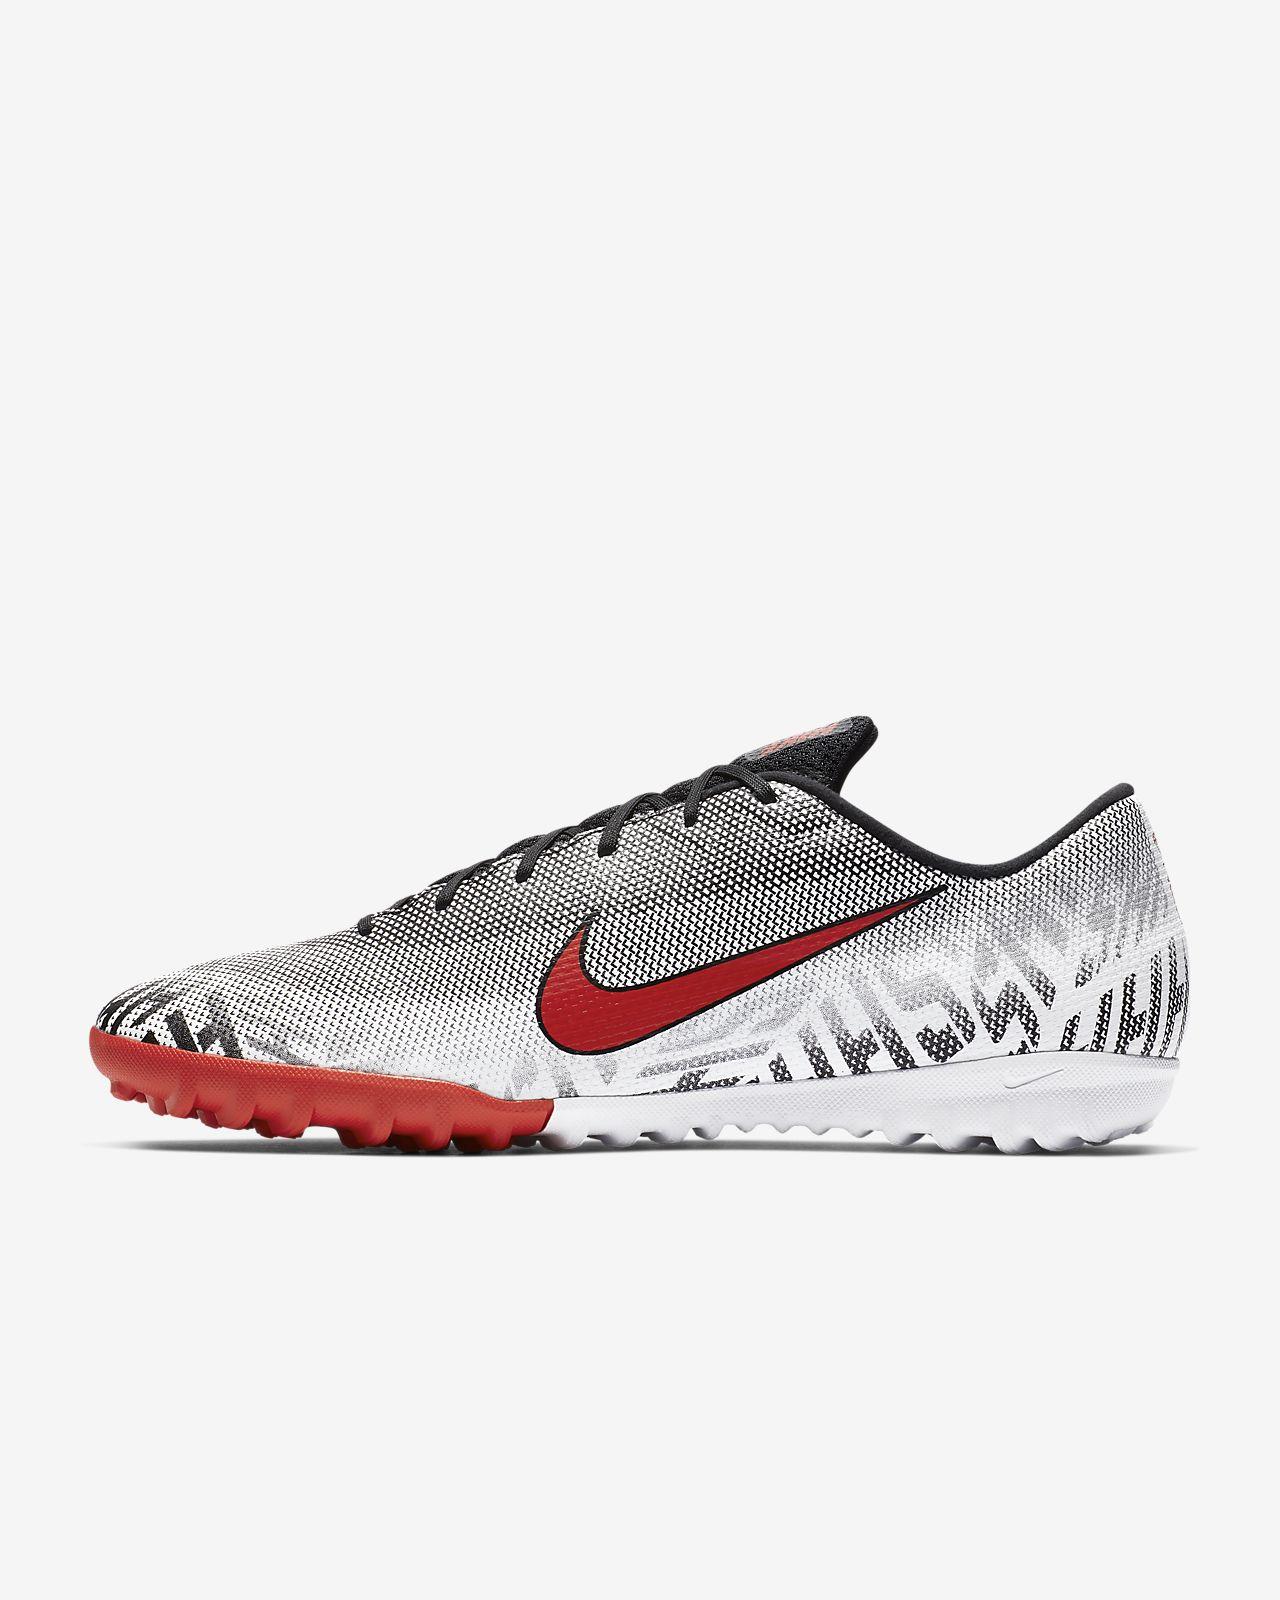 ... Nike Mercurial Vapor XII Academy Neymar TF Artificial-Turf Football Shoe e27bdc5da